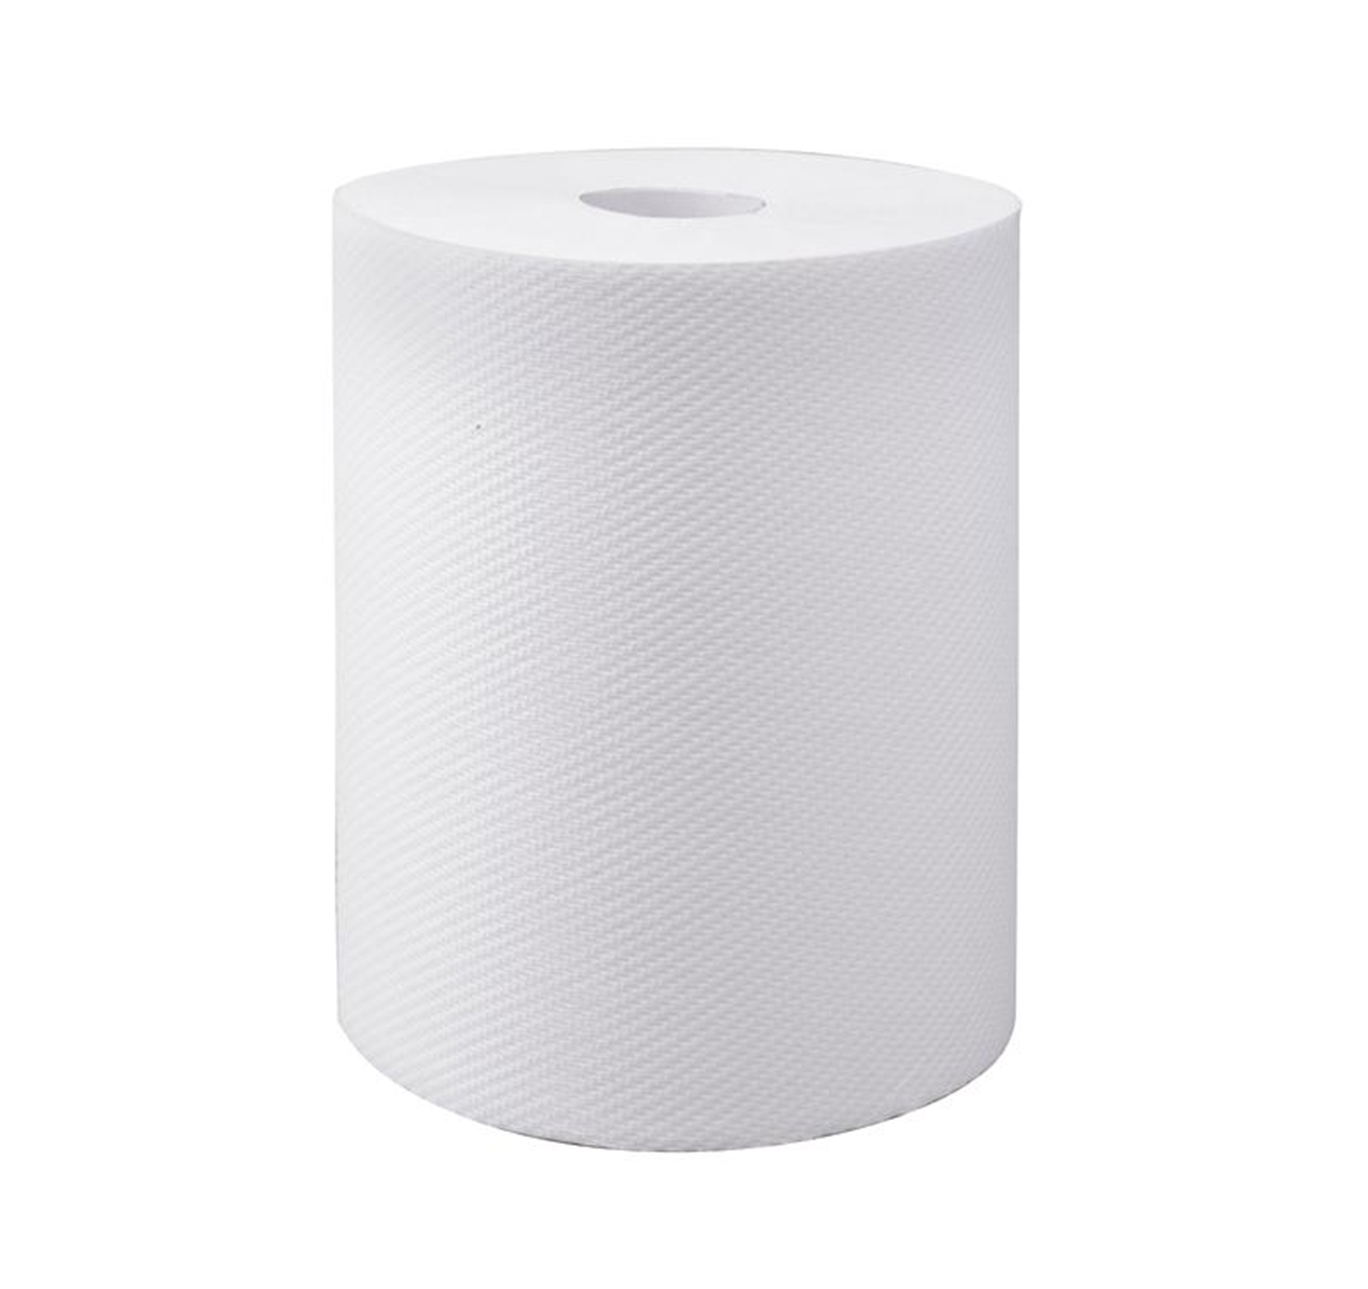 Durelle Ultimate Roll Towel-0